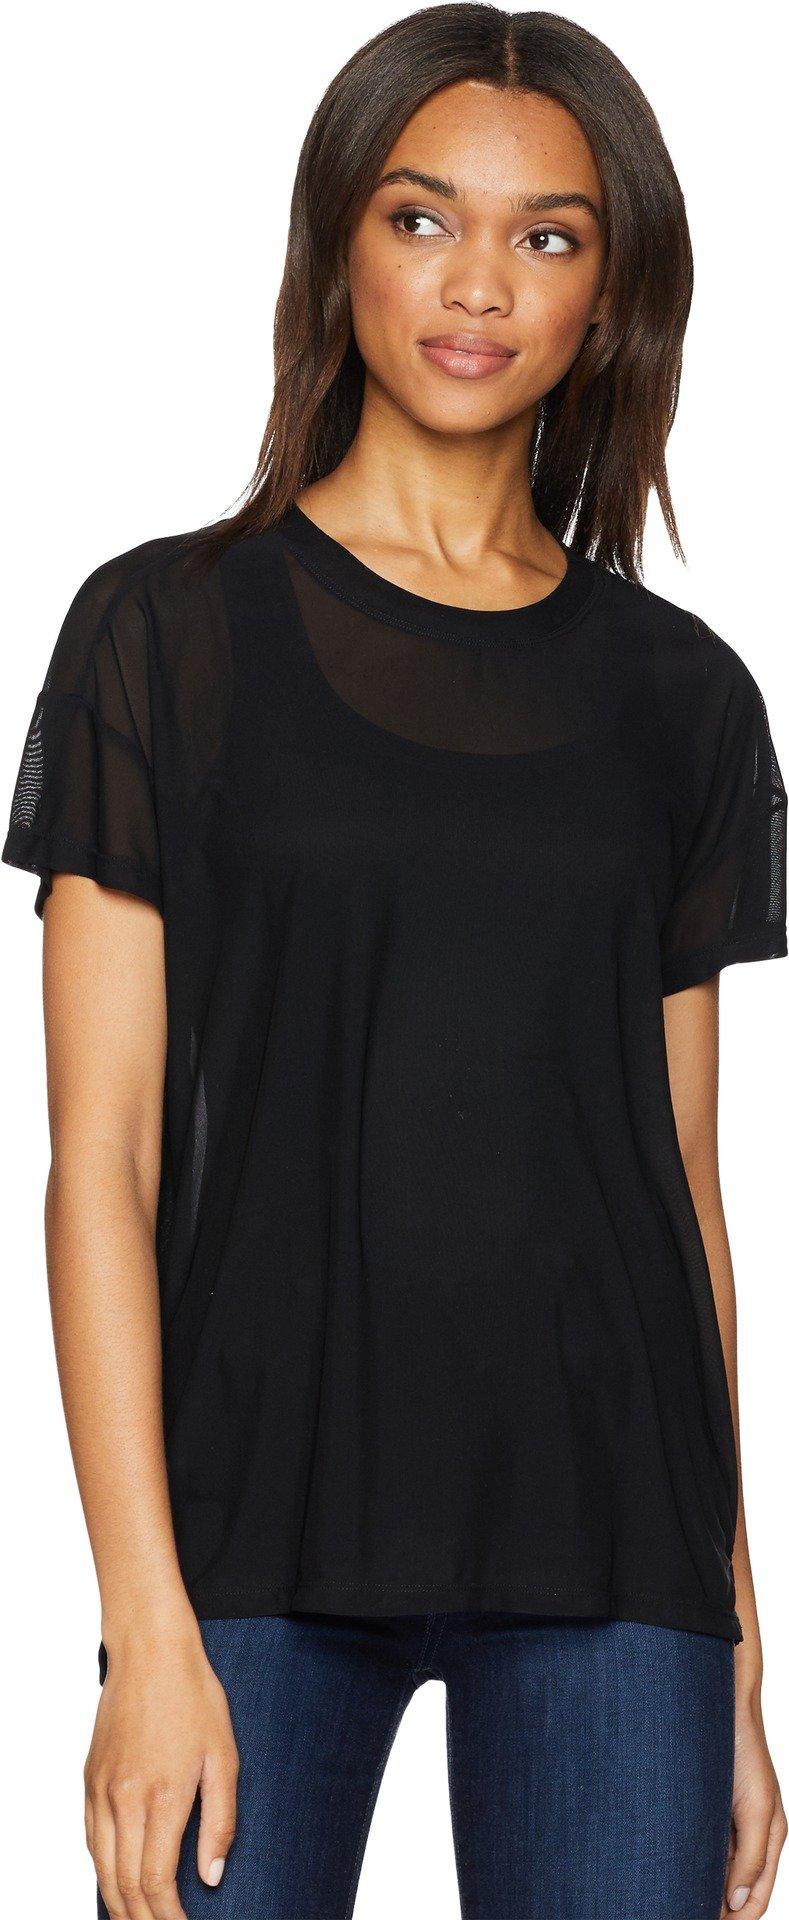 UNIONBAY Women's Fine Mesh Top, Black, Large